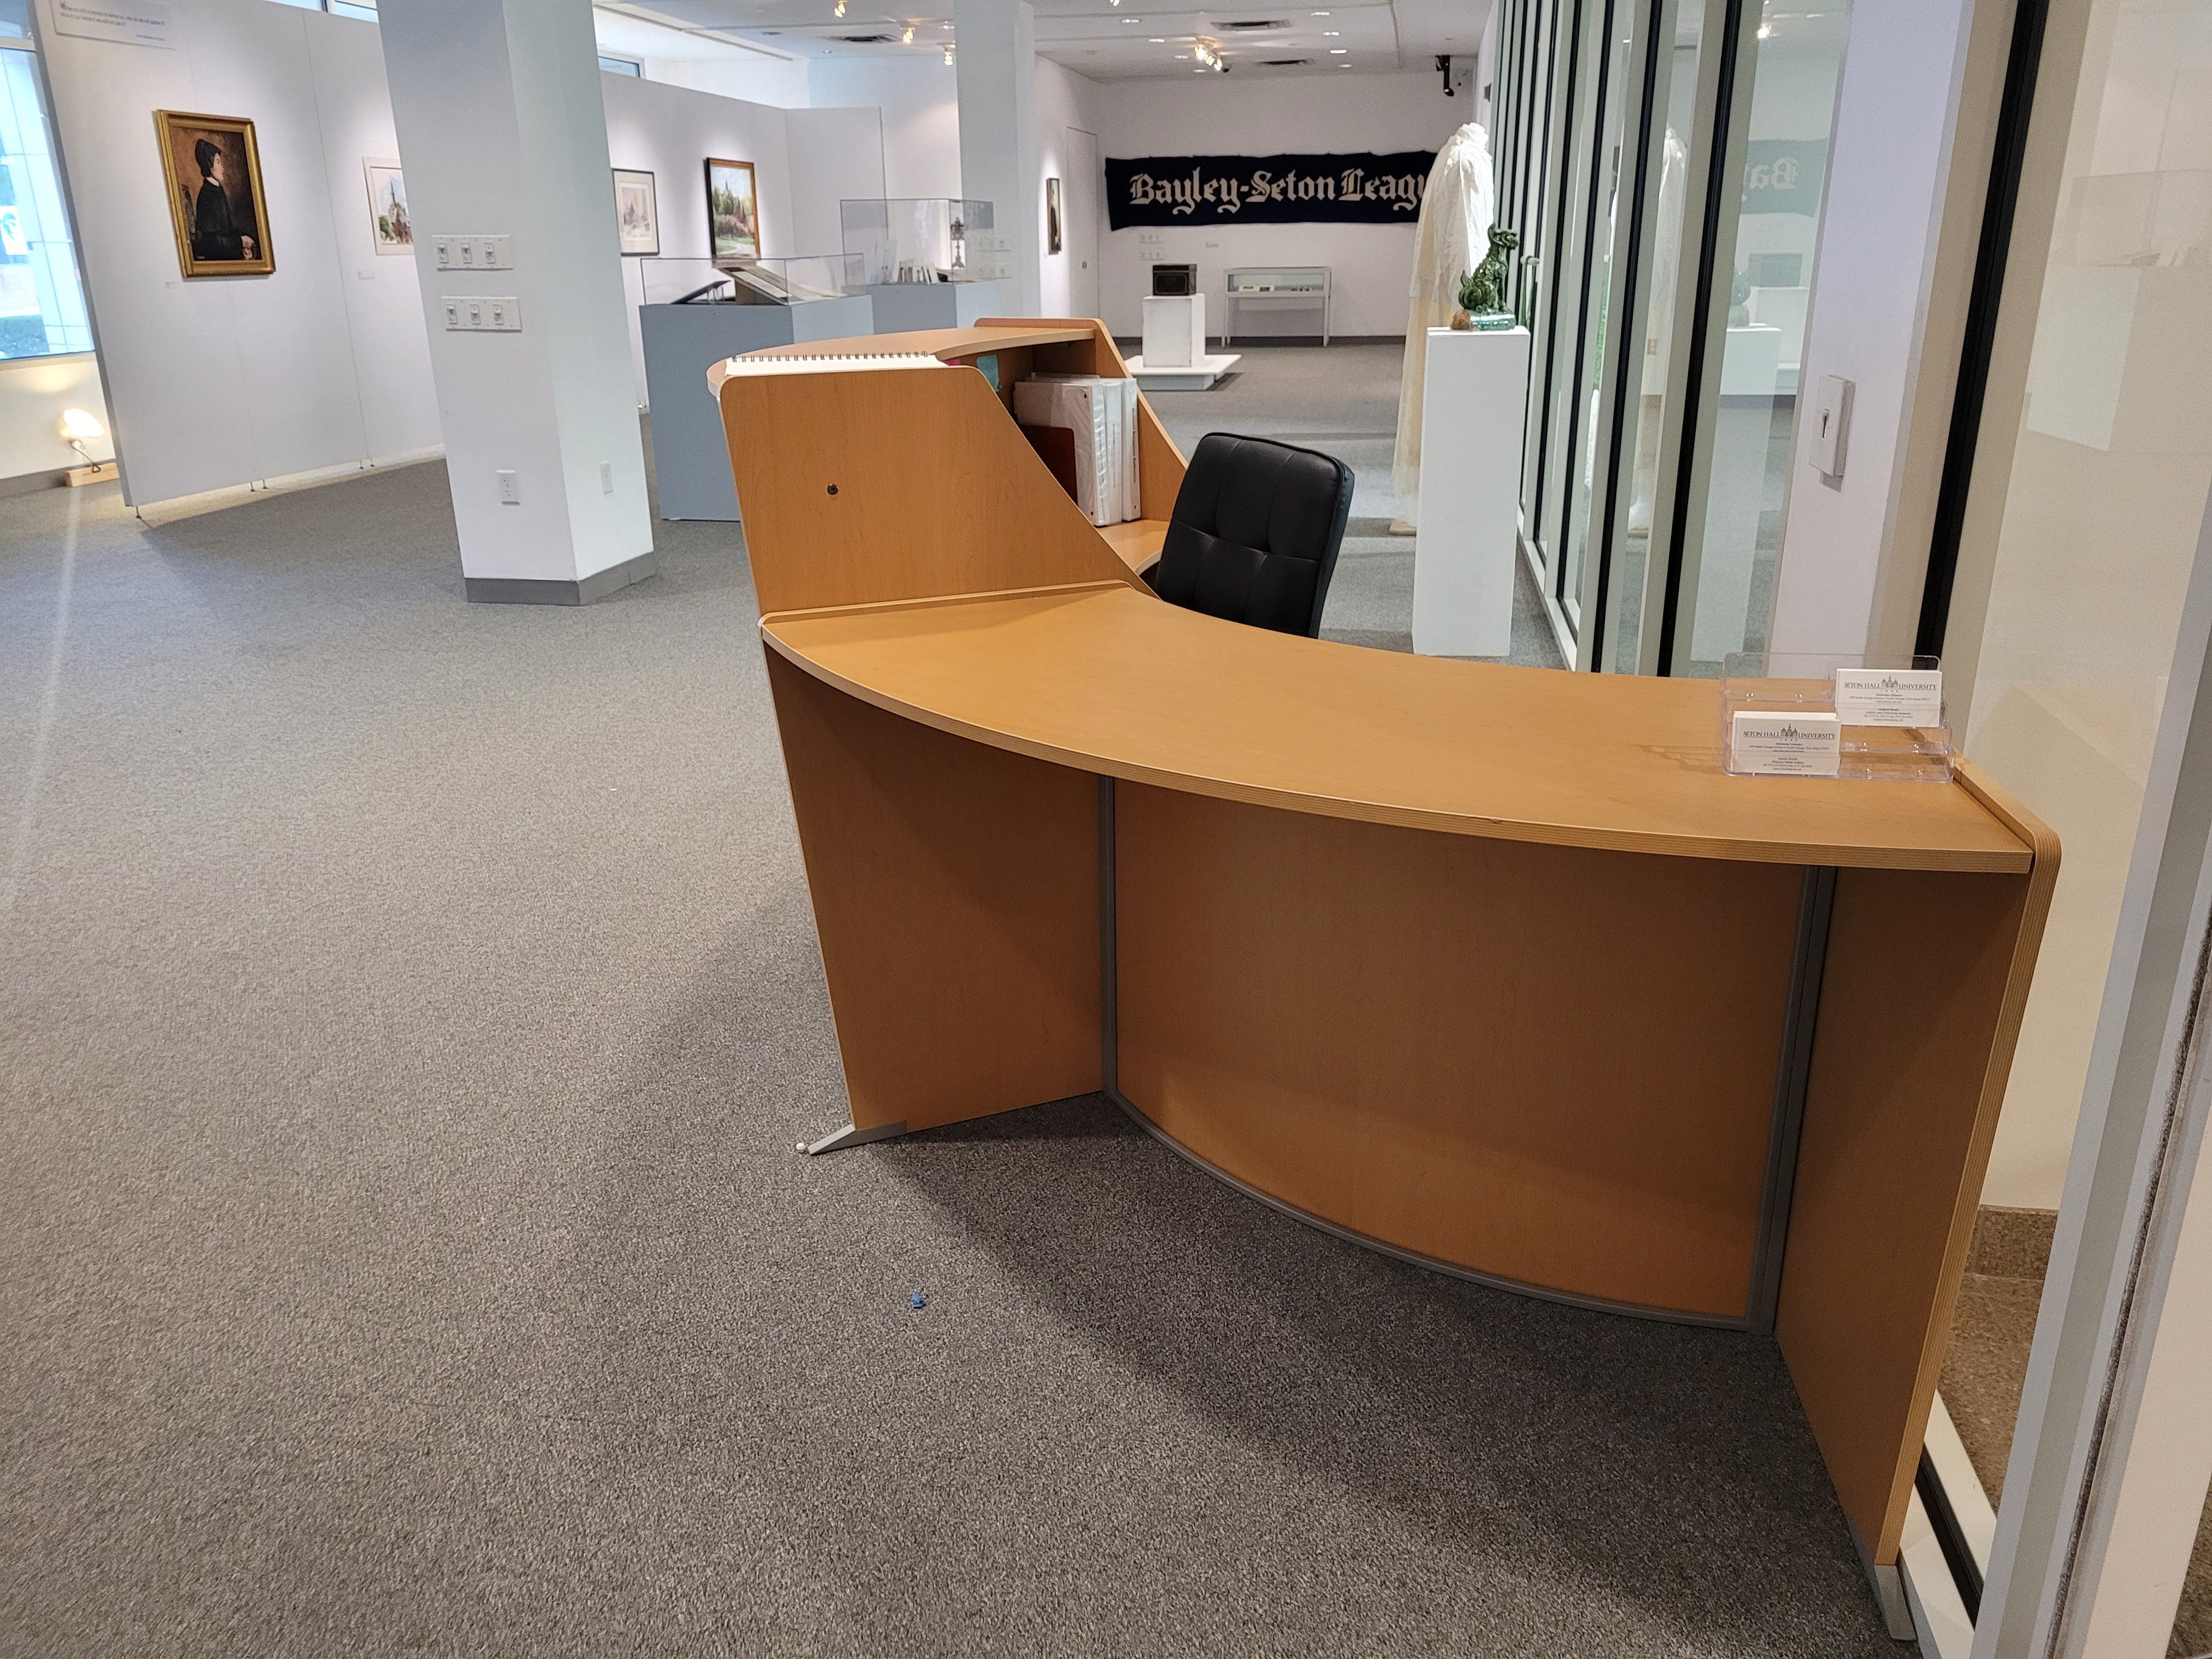 Gallery Welcome Desk